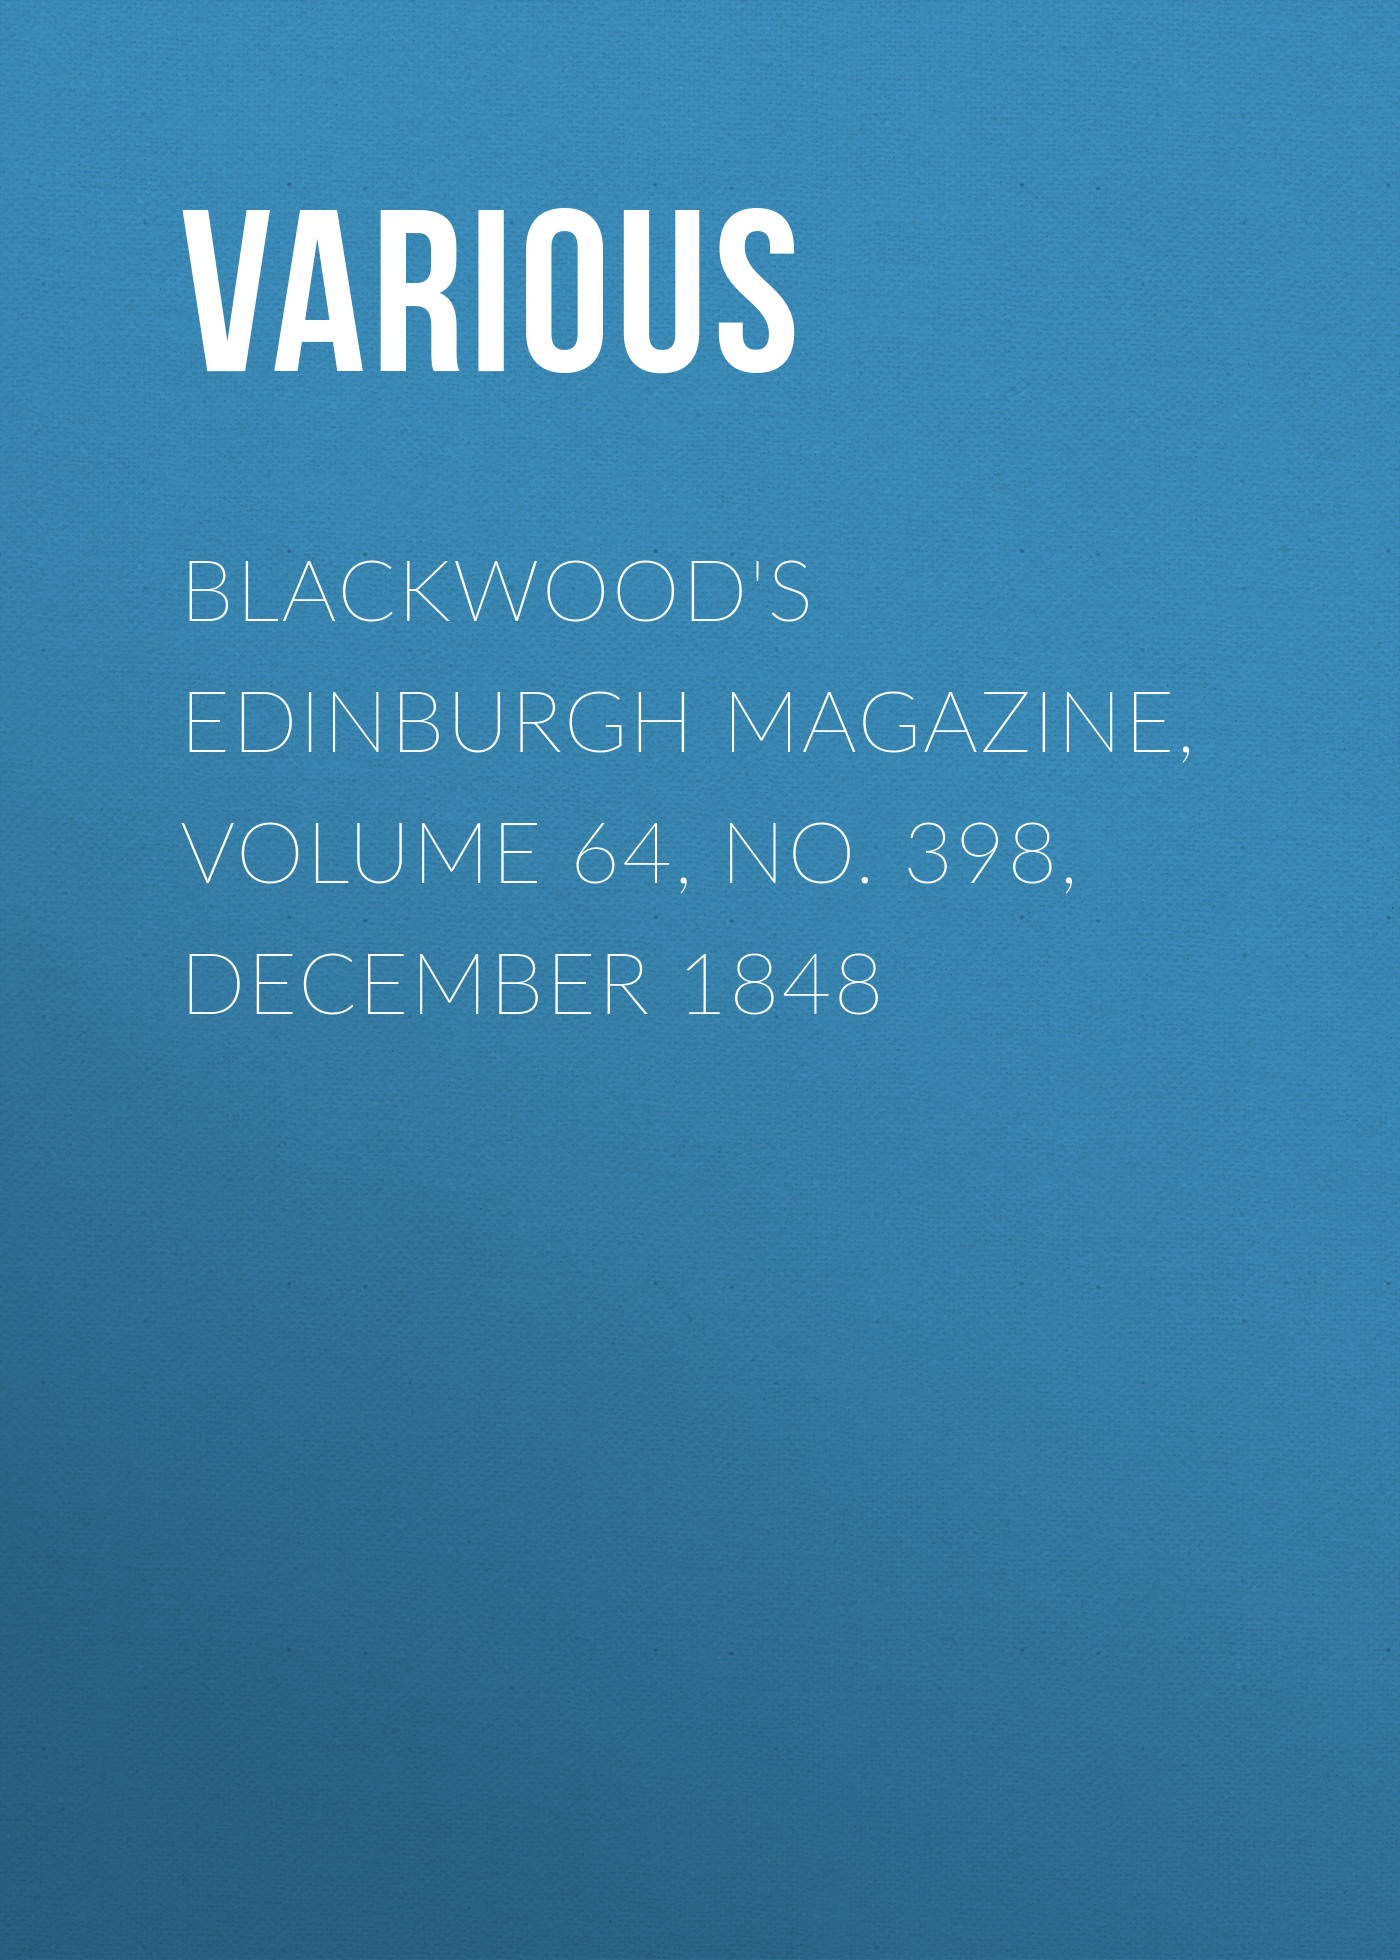 Various Blackwood's Edinburgh Magazine, Volume 64, No. 398, December 1848 henry woodward geological magazine volume 22